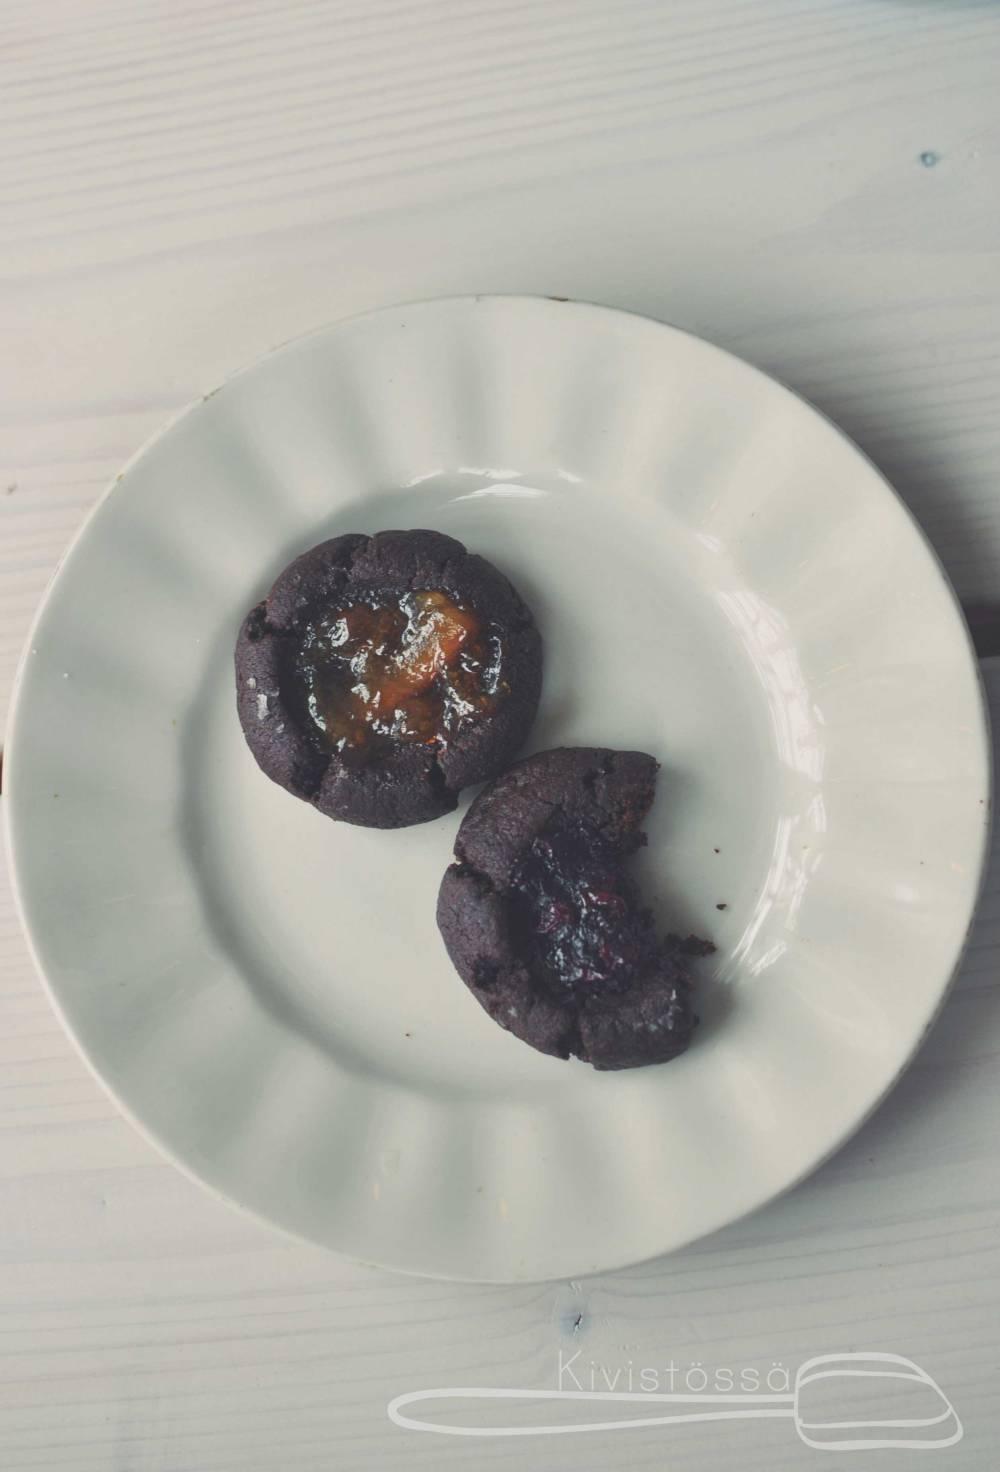 Thumbprint cookies - Kivistössä Foodblog www.kivistossa.com